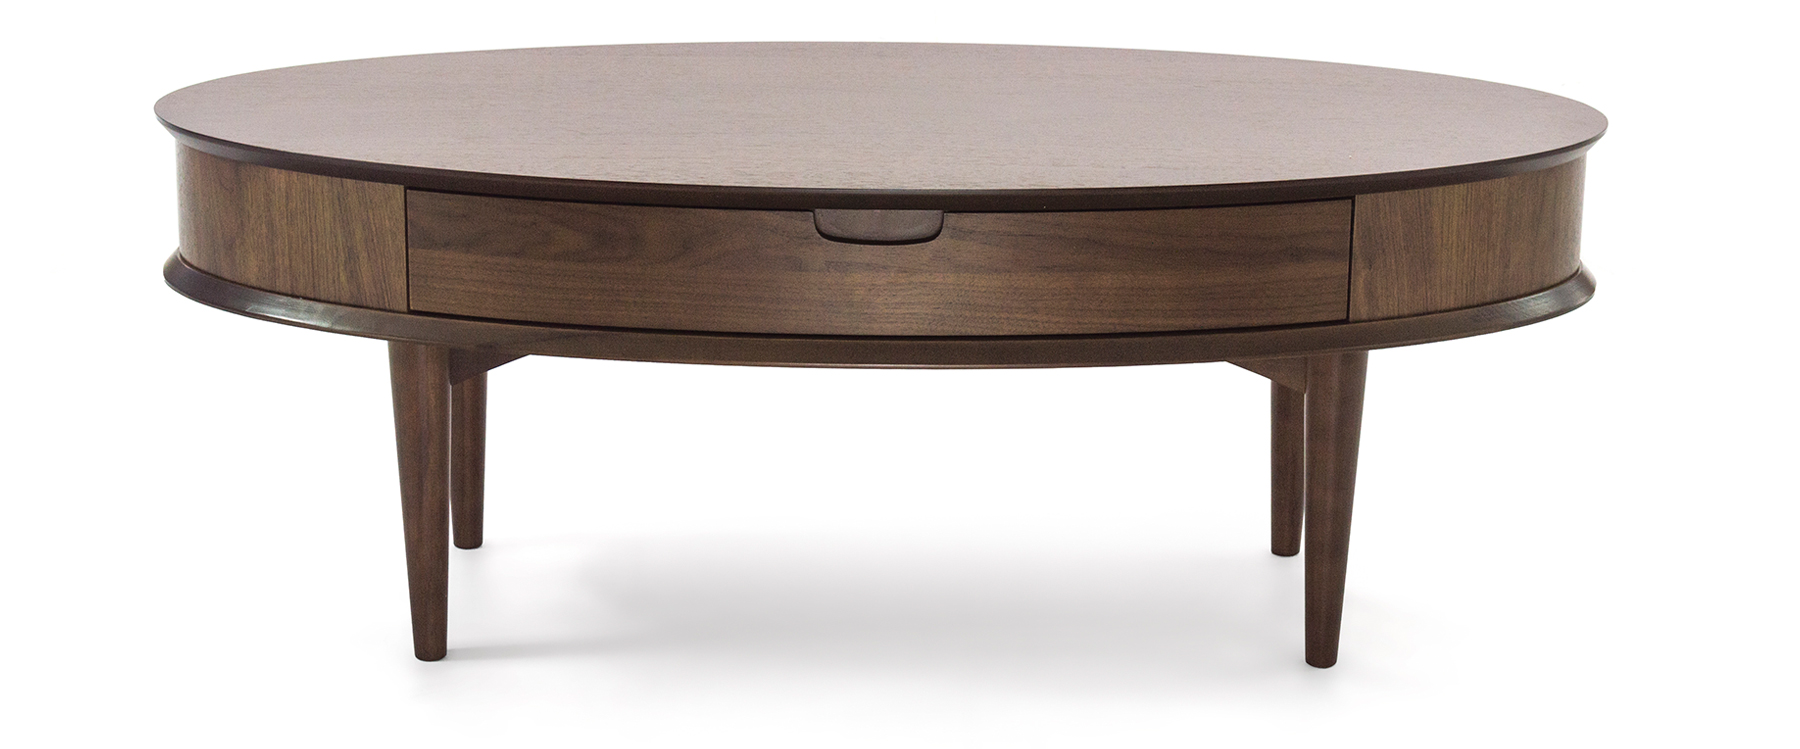 Oslo Walnut Coffee Table With Drawer Ez Living Furniture Dublin